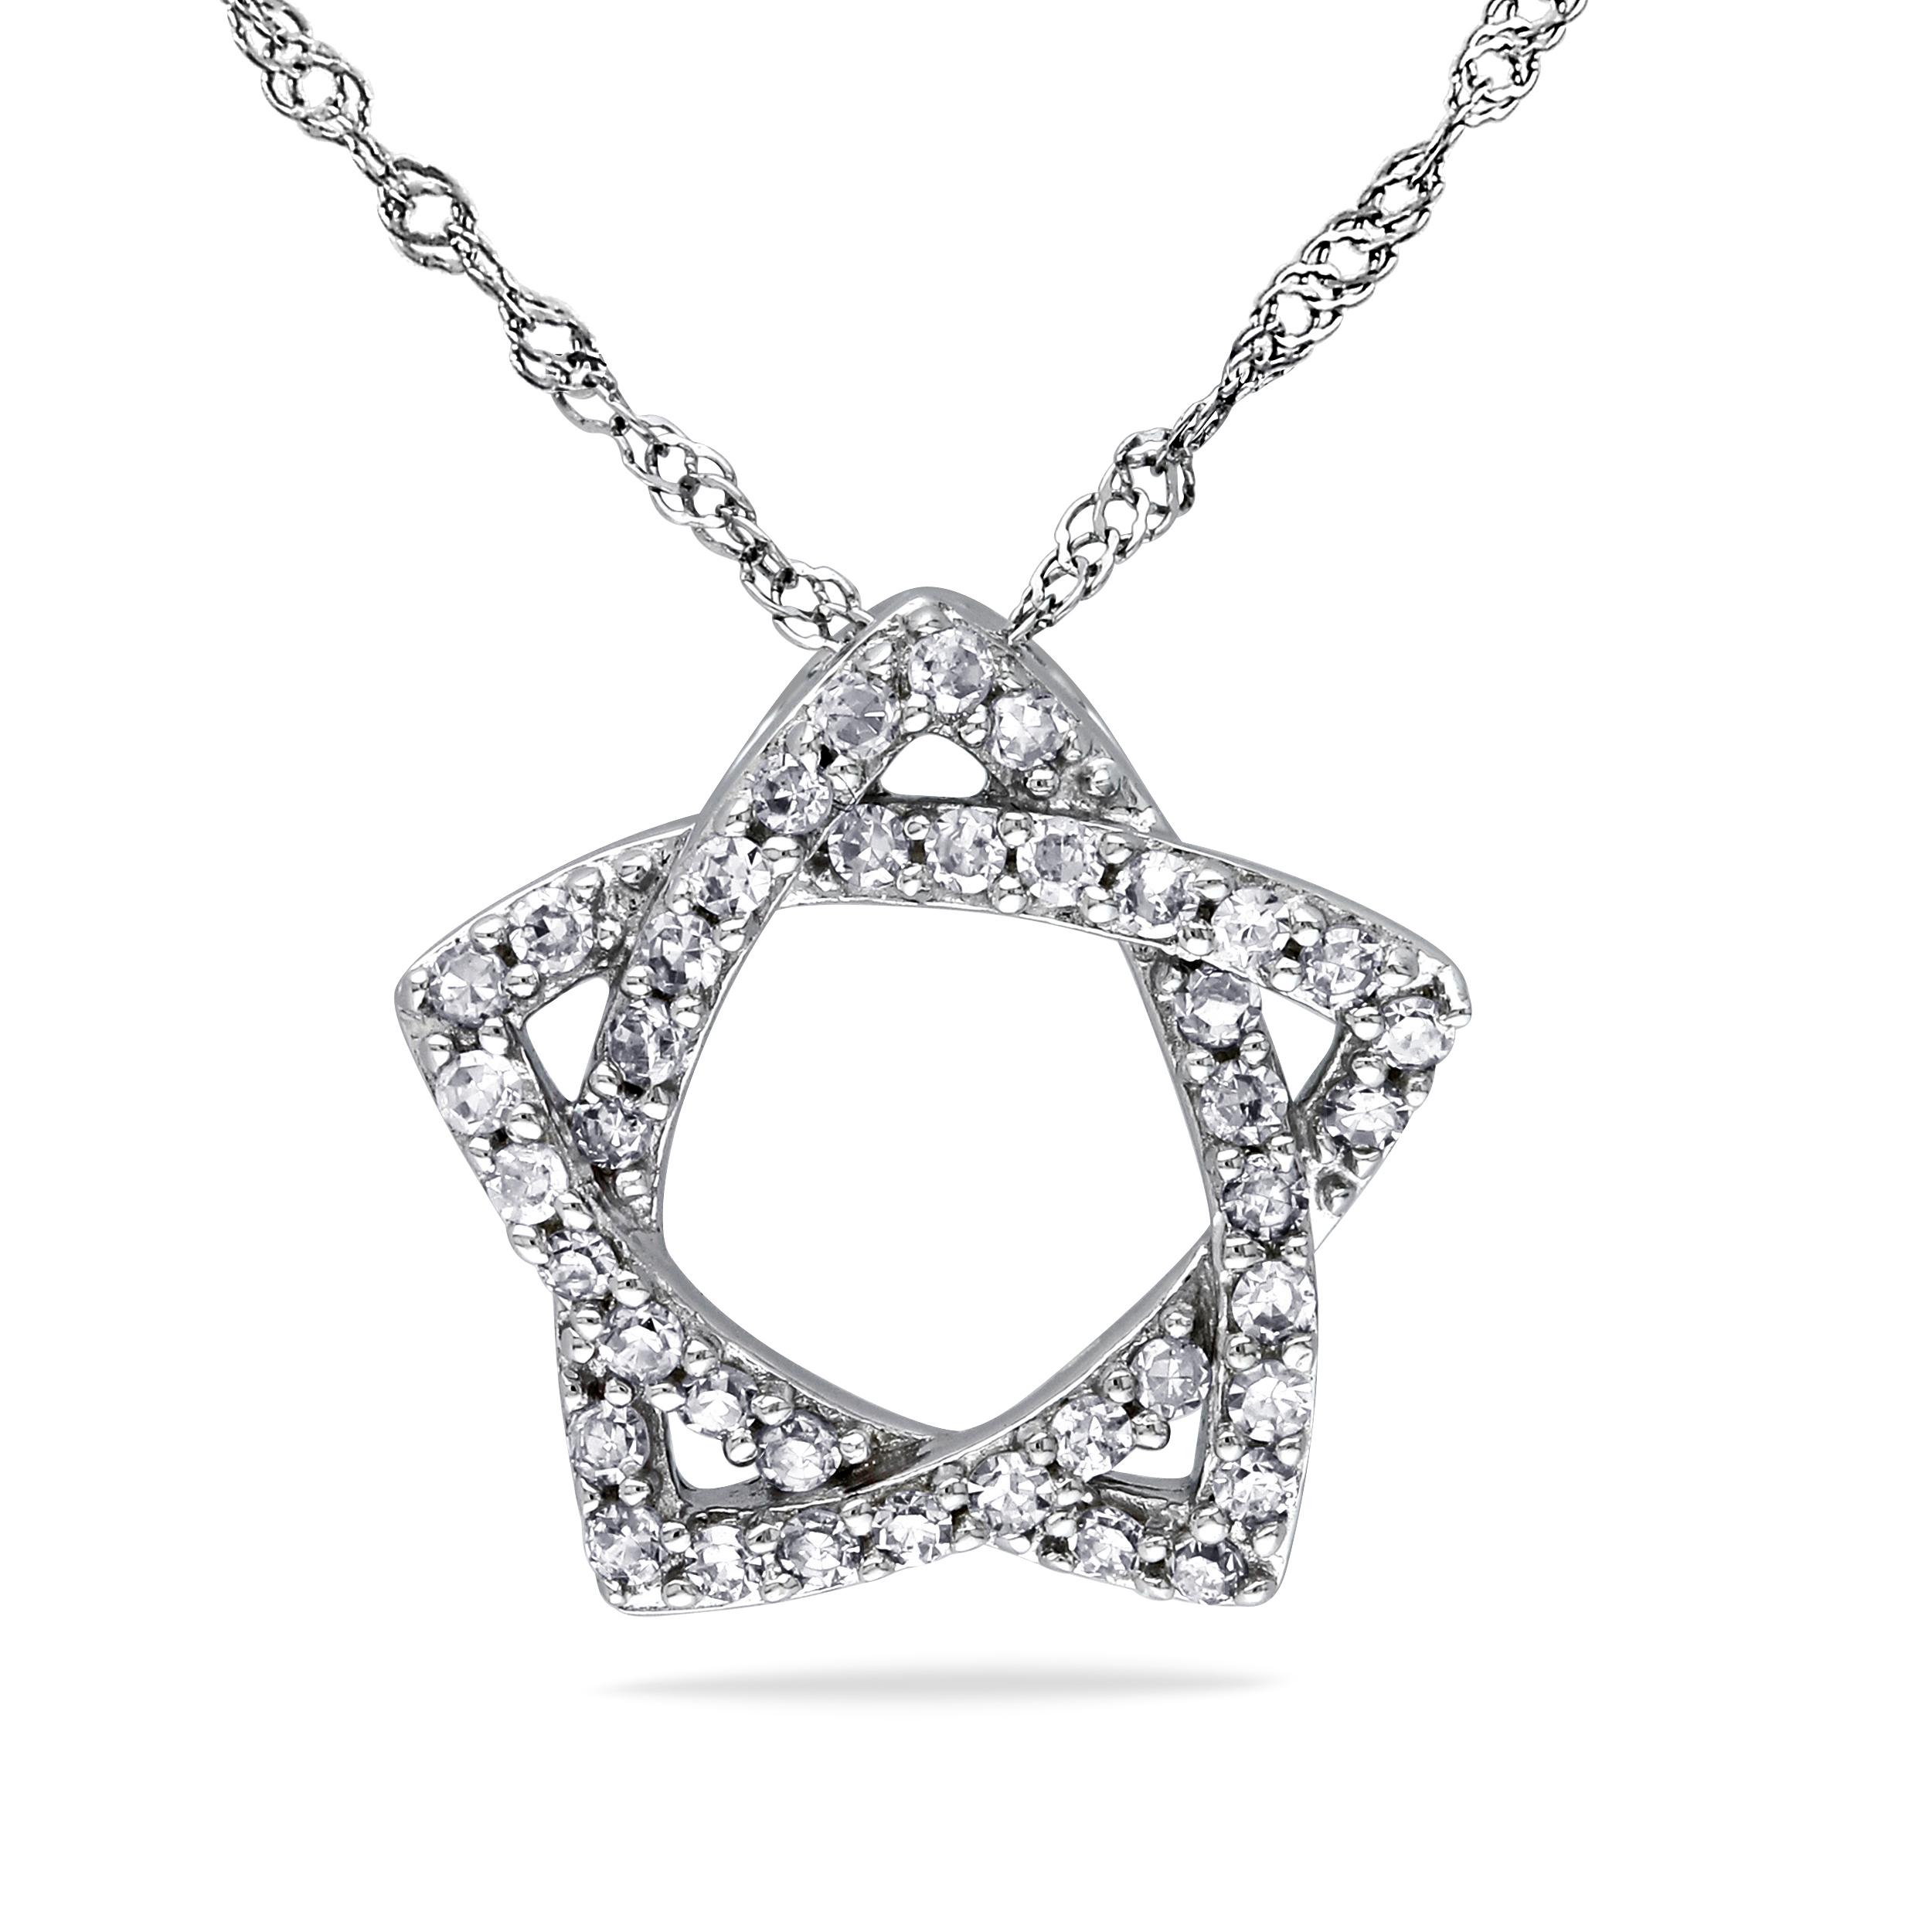 Allurez 14kt Yellow Gold Diamond V Shaped Pendant Necklace - 16 Inches 66jjW7VJBt